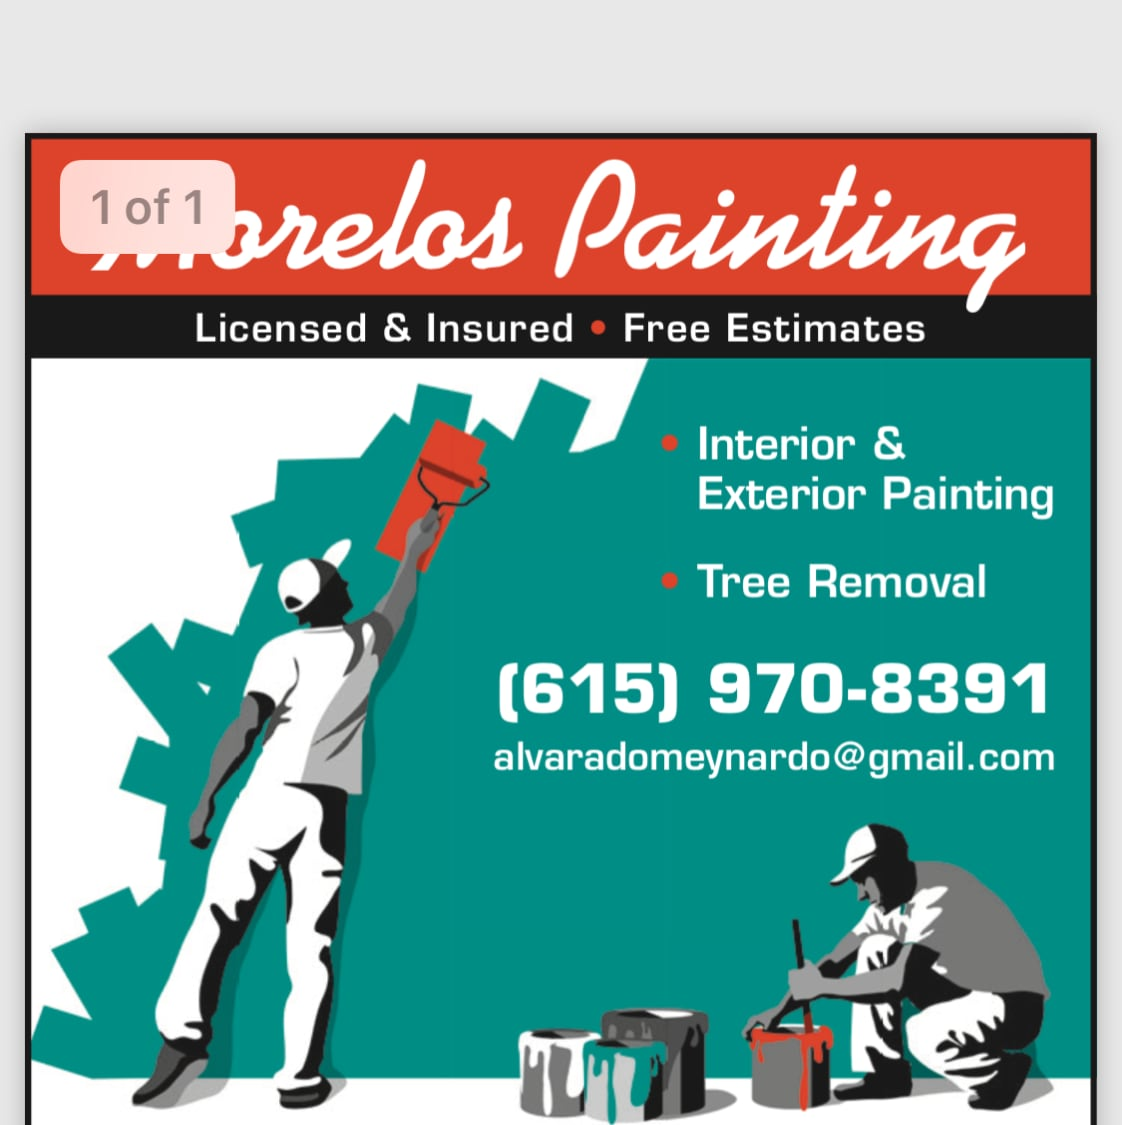 Morelos painting